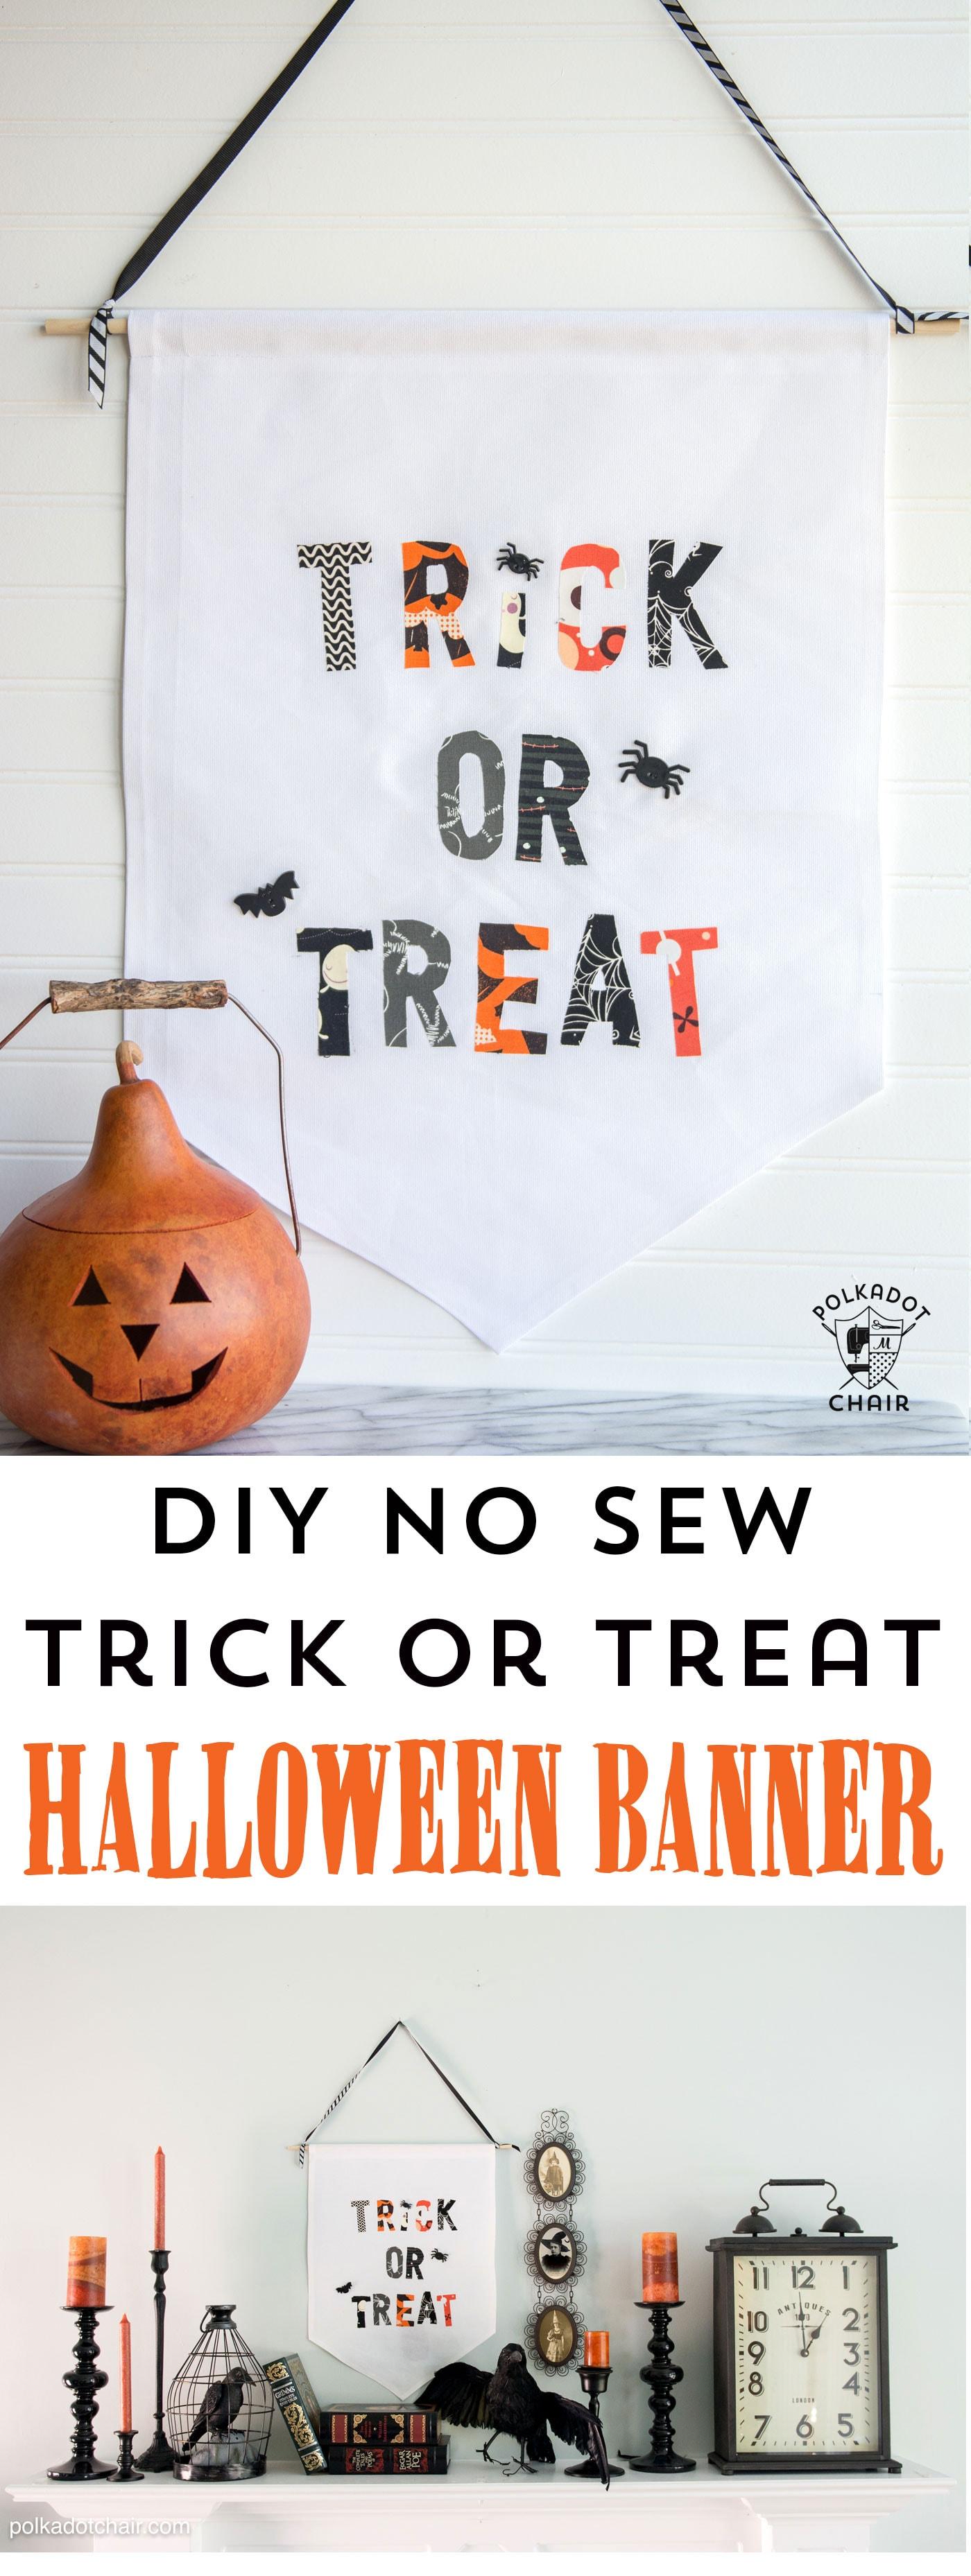 Diy Trick Or Treat Halloween Banner The Polka Dot Chair